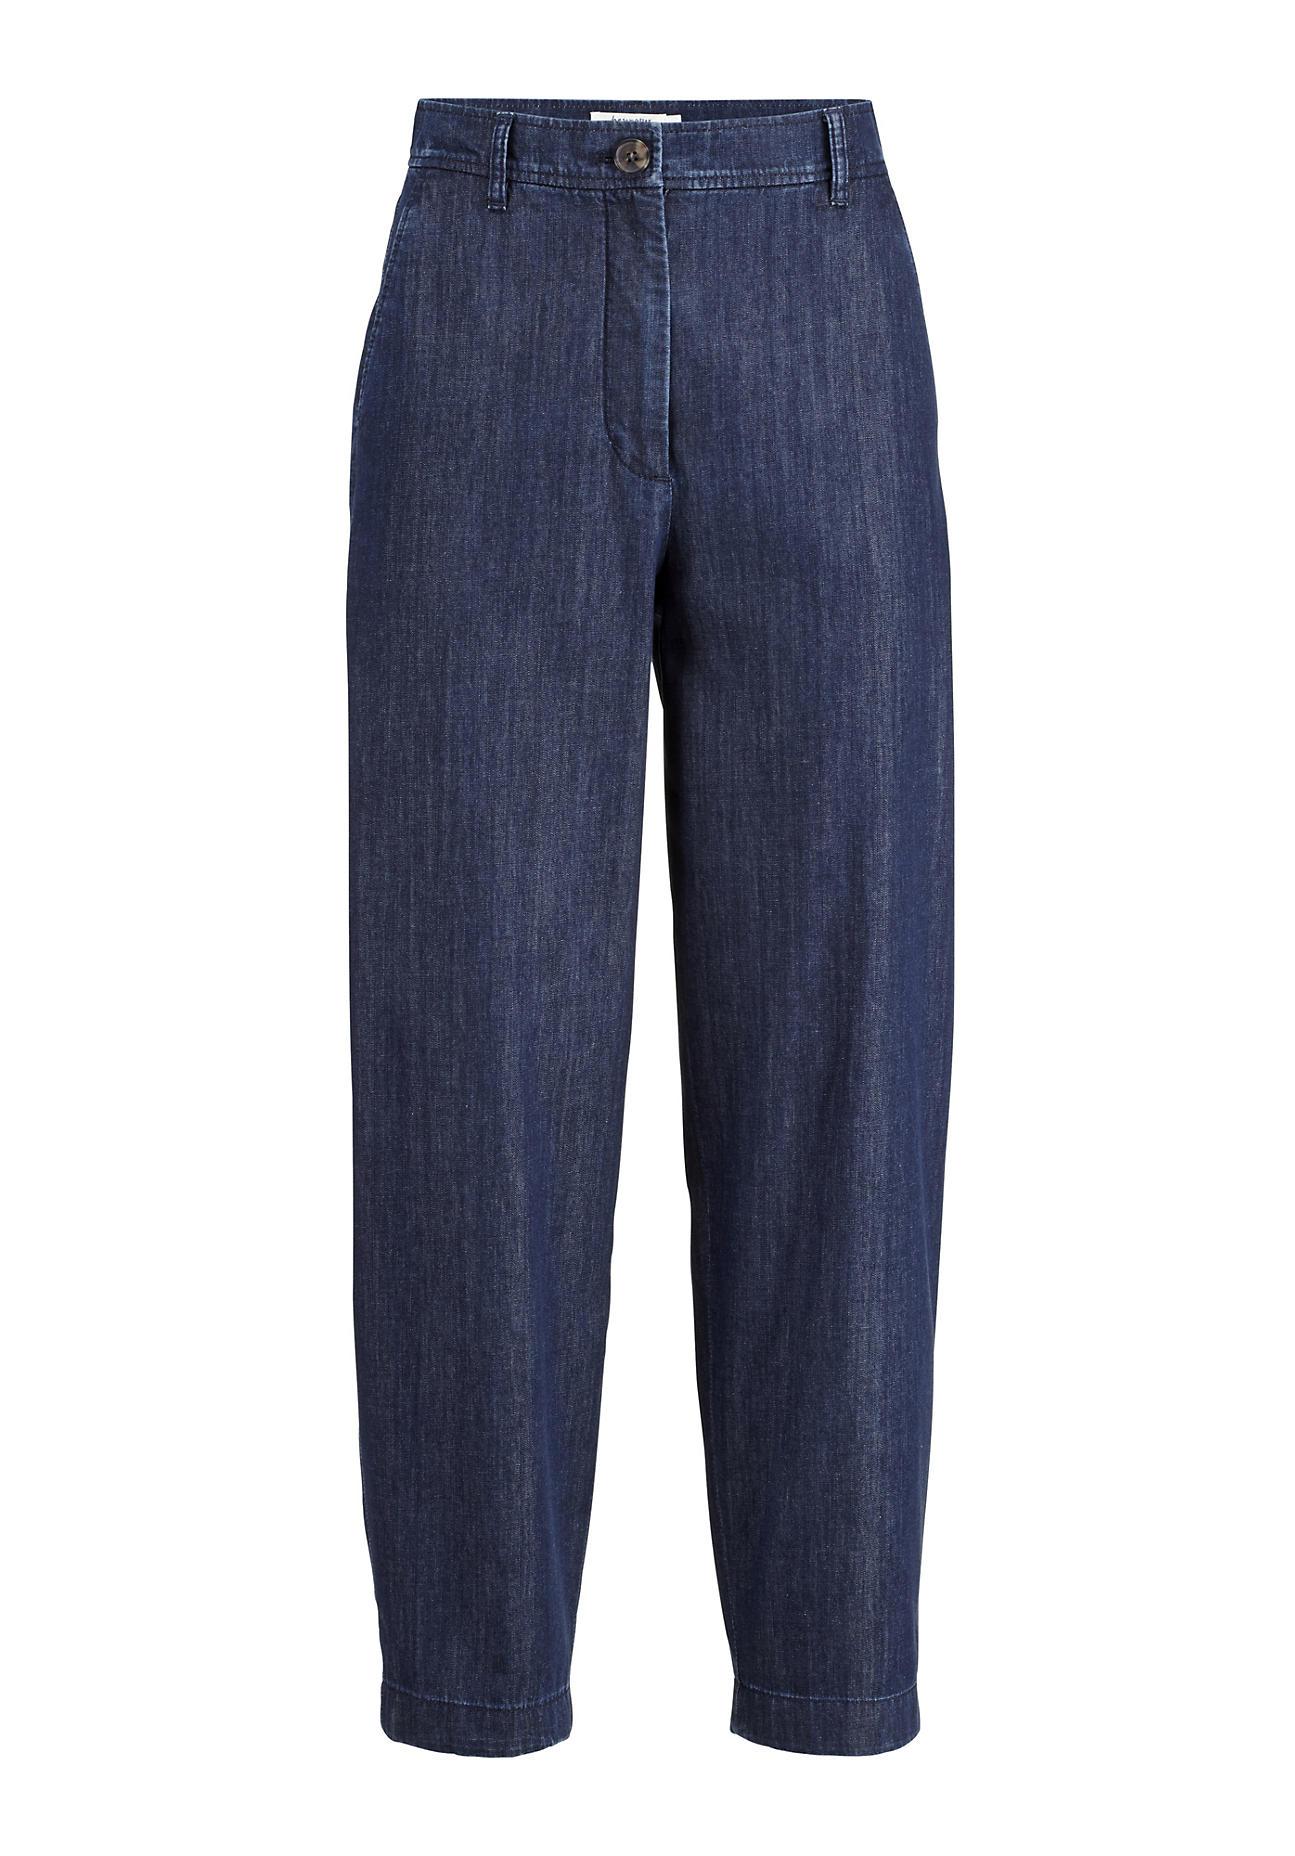 Hosen - hessnatur Damen Jeans aus Bio Denim – blau –  - Onlineshop Hessnatur